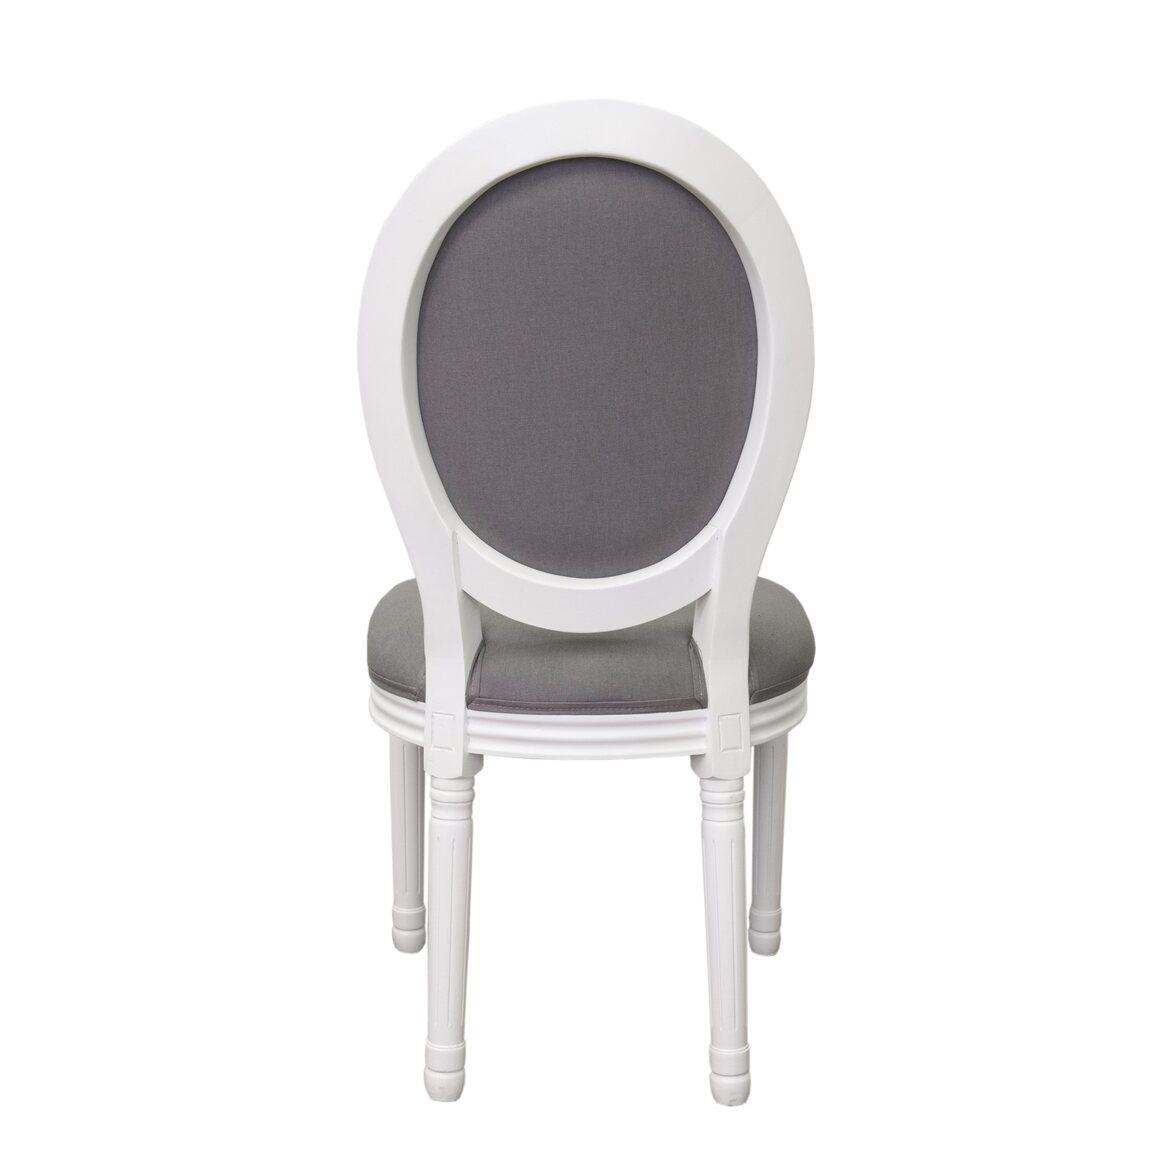 Стул Volker grey+white 3 | Обеденные стулья Kingsby